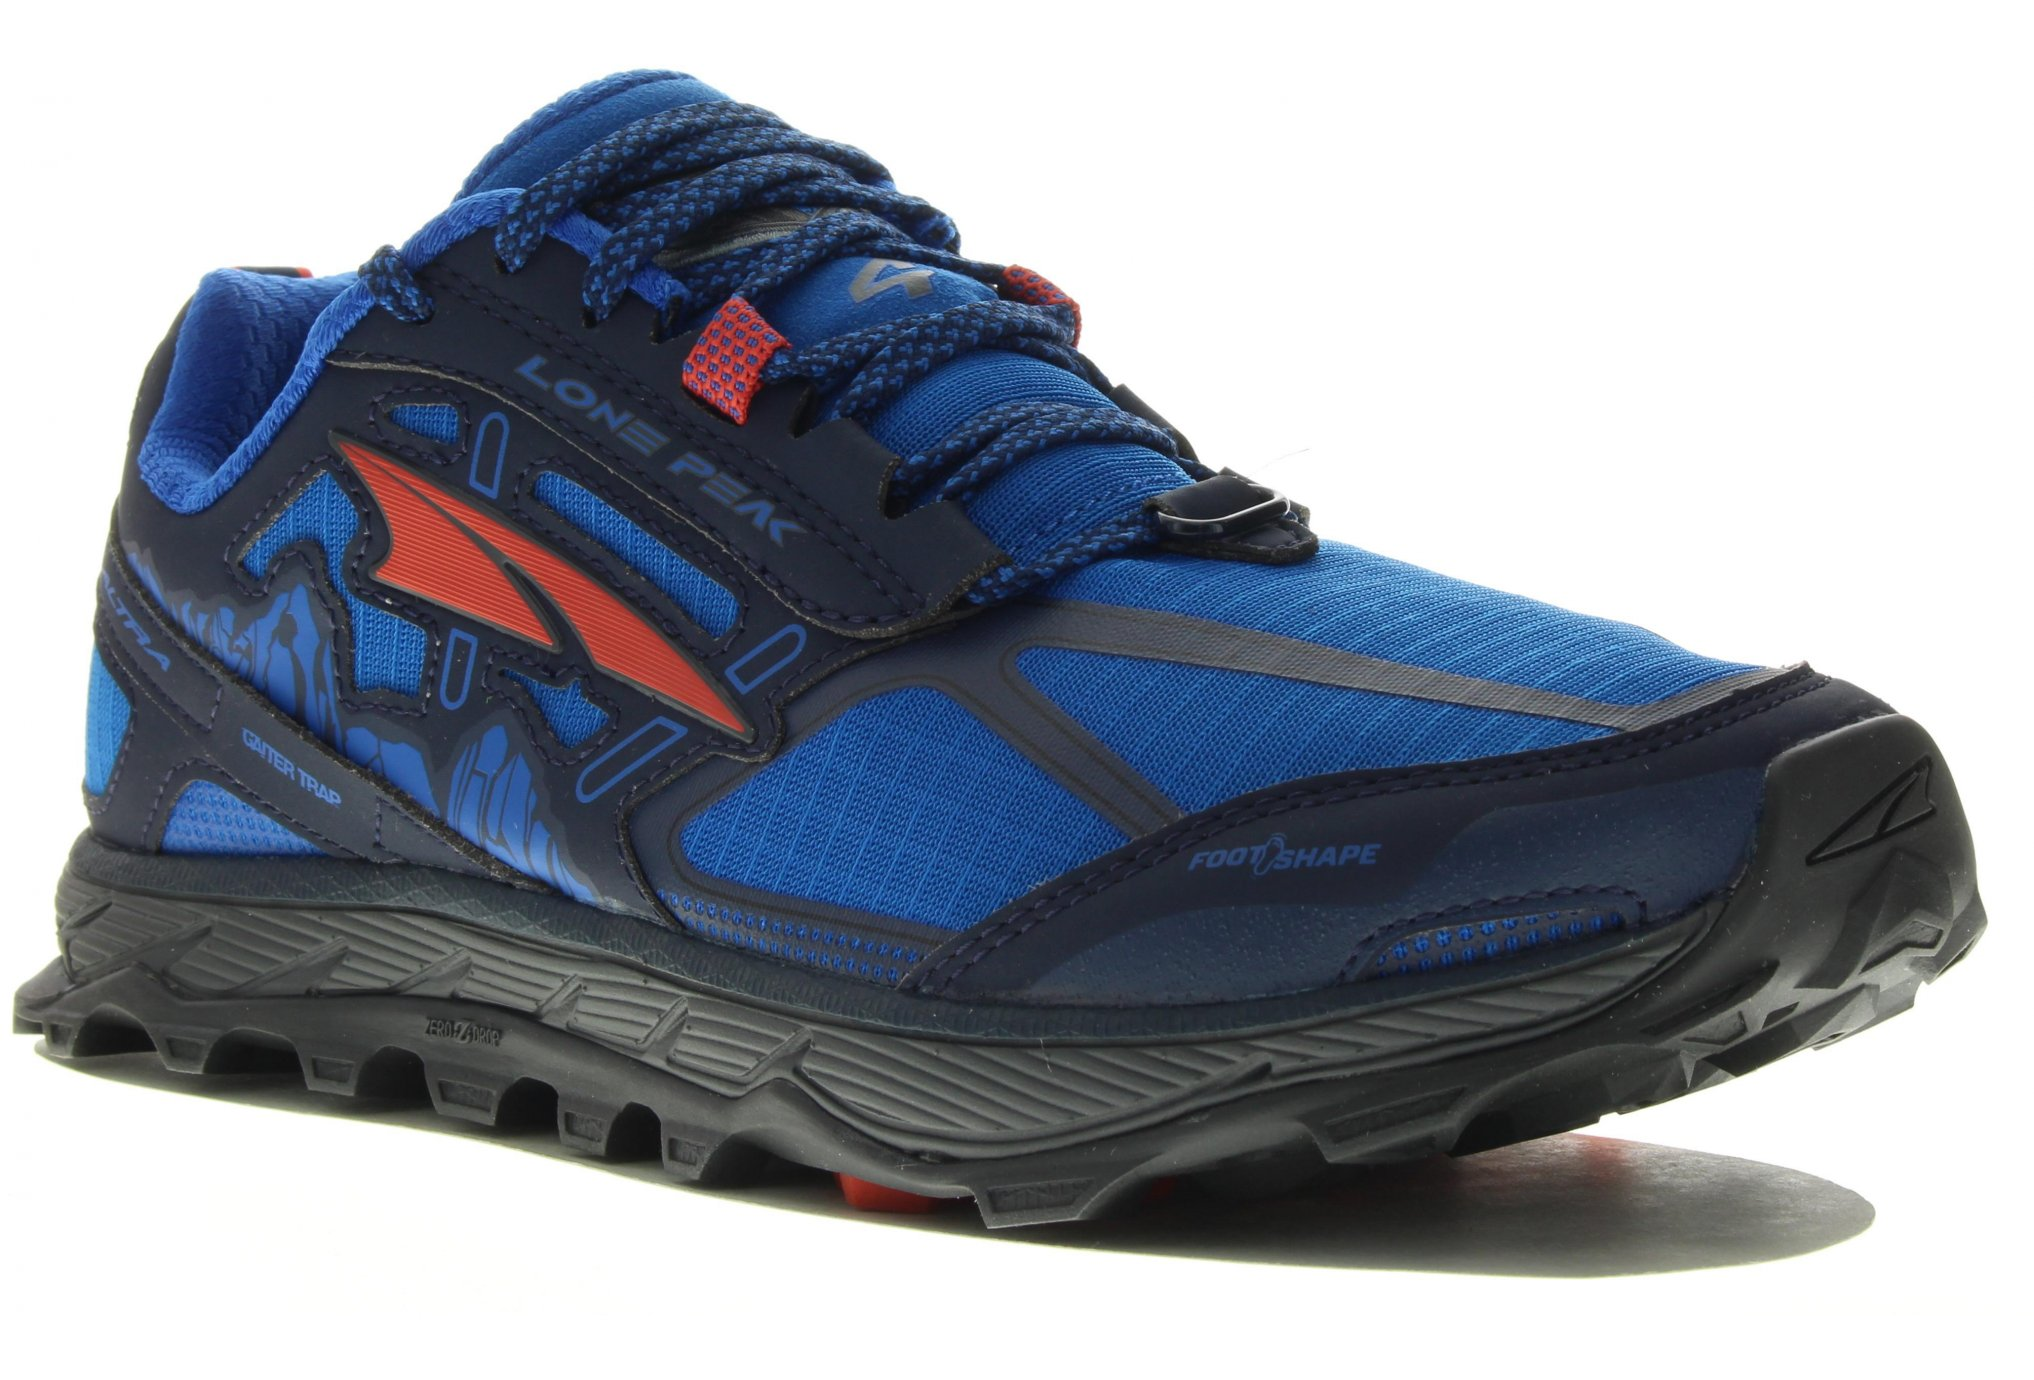 altra lone peak 4 m chaussures homme 254252 1 sz